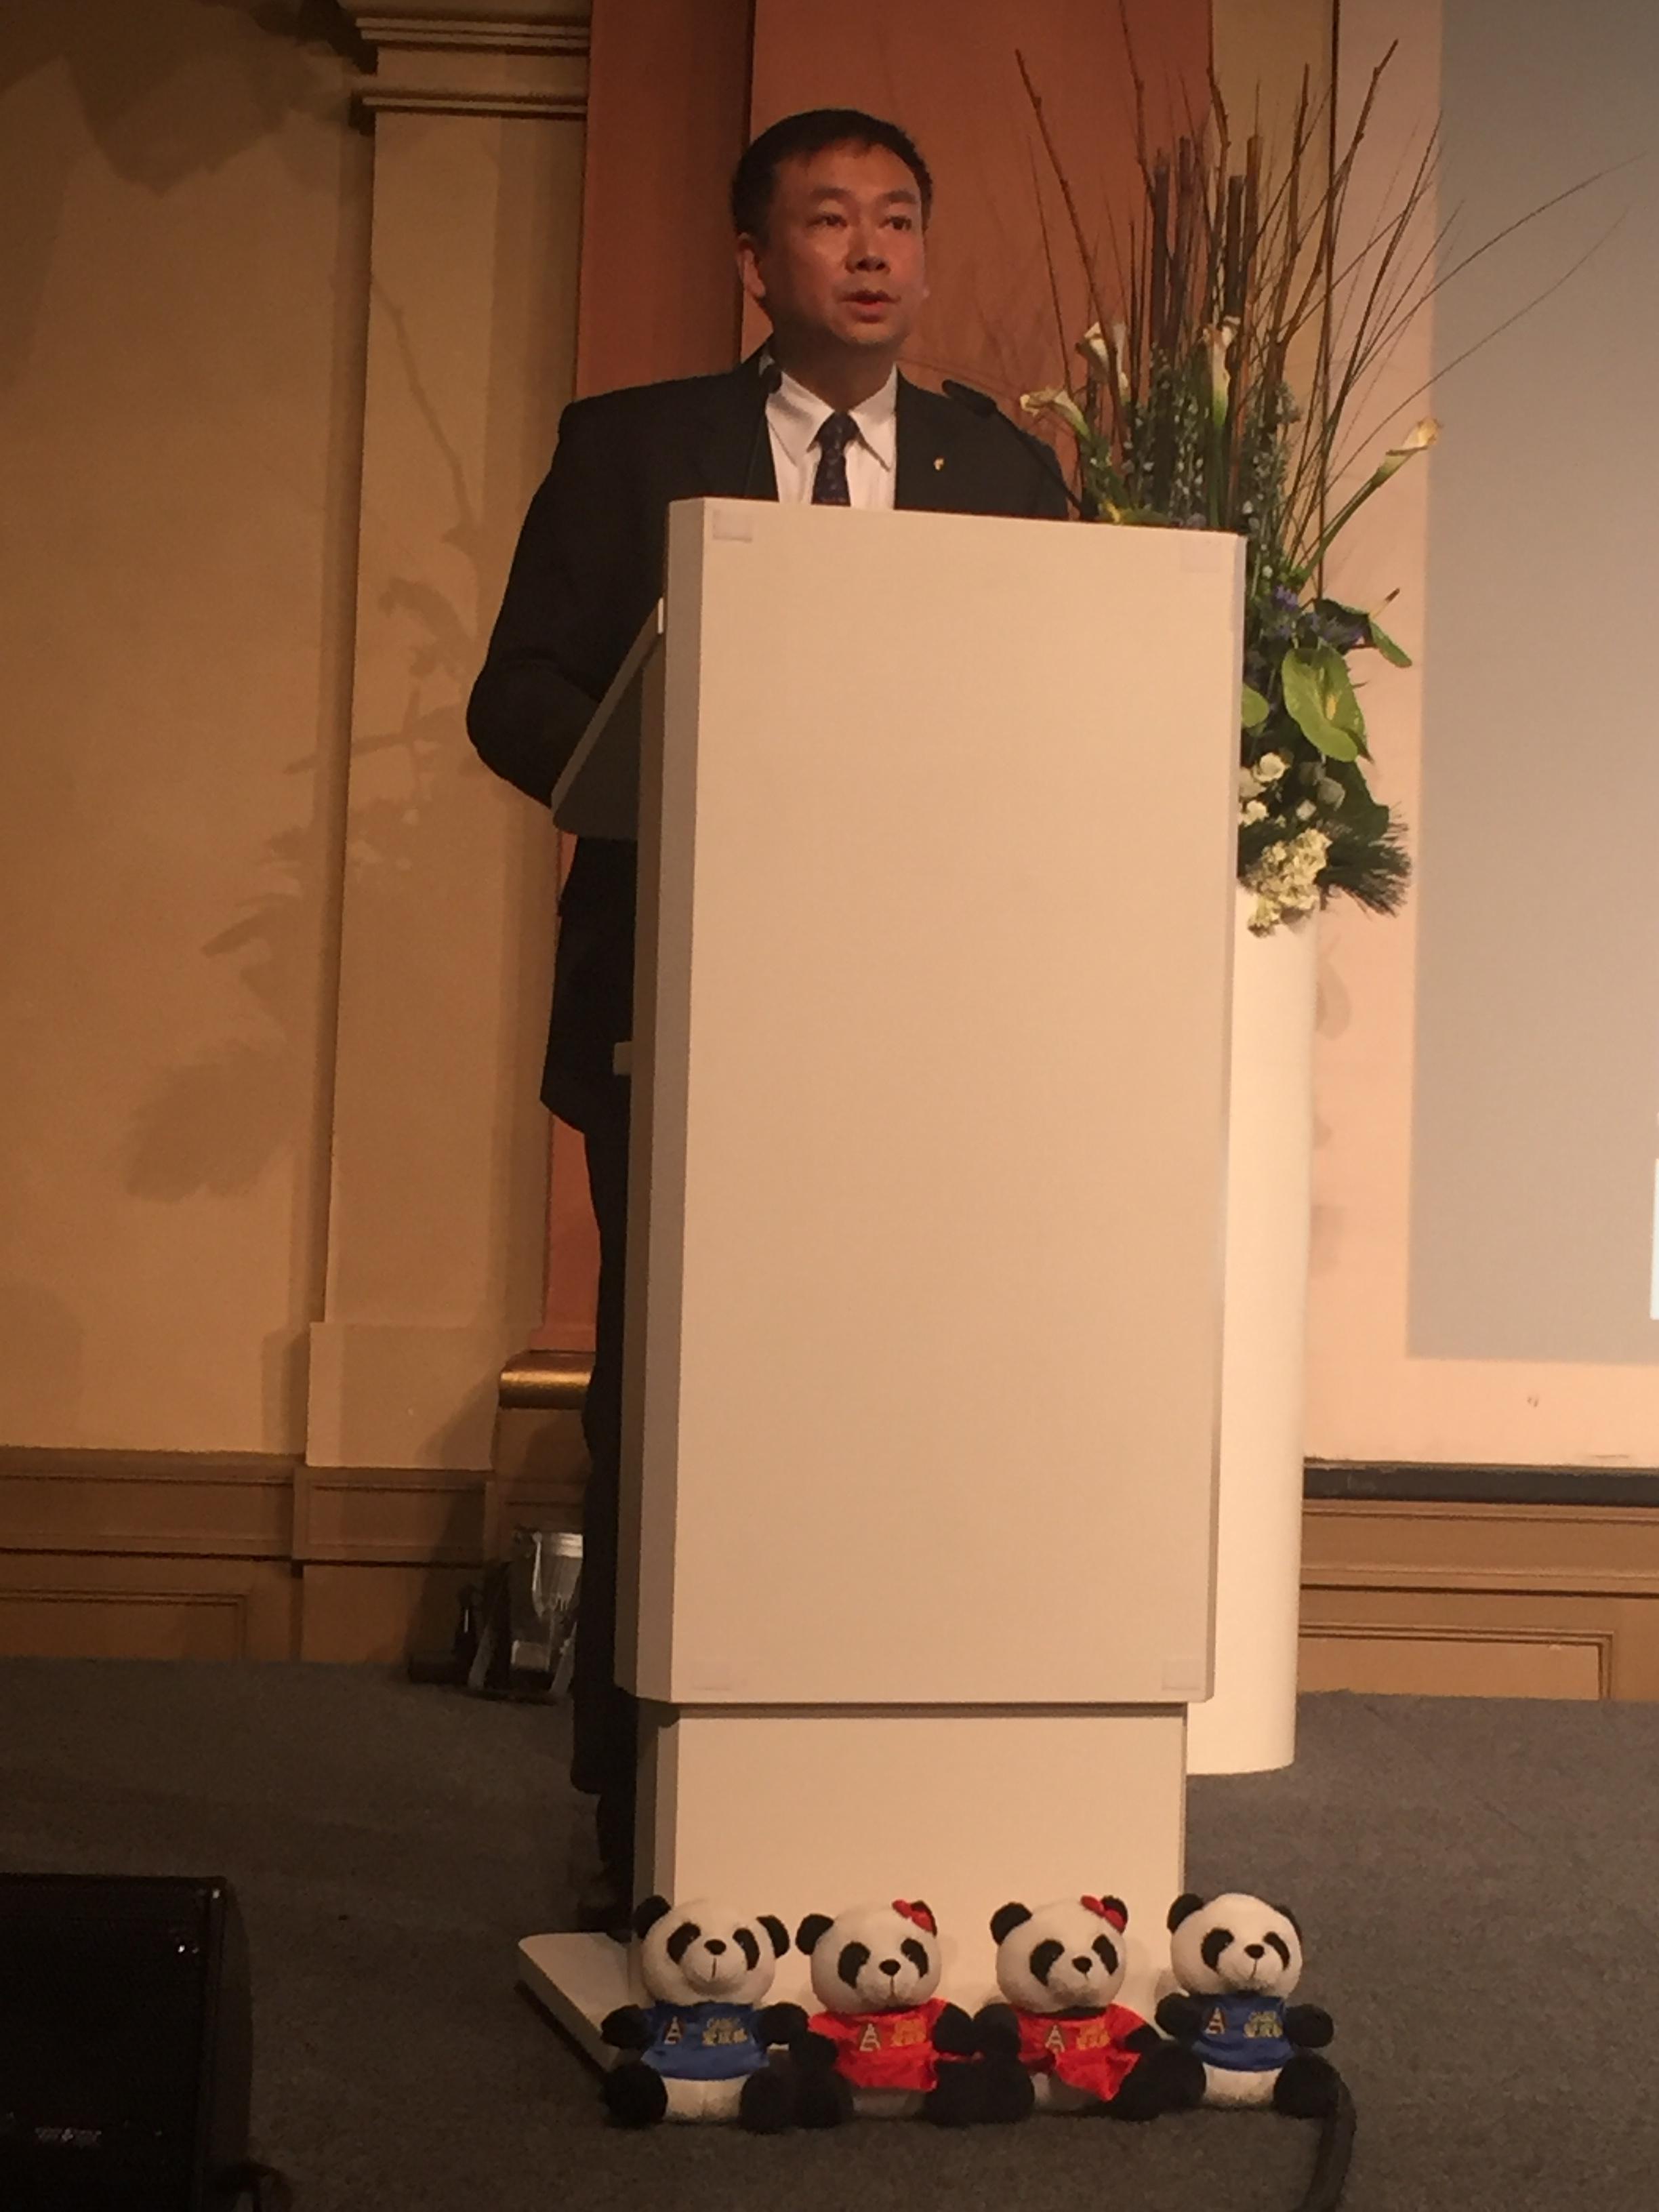 Delegationsleiter YIN Jian stellt Chengdu vor